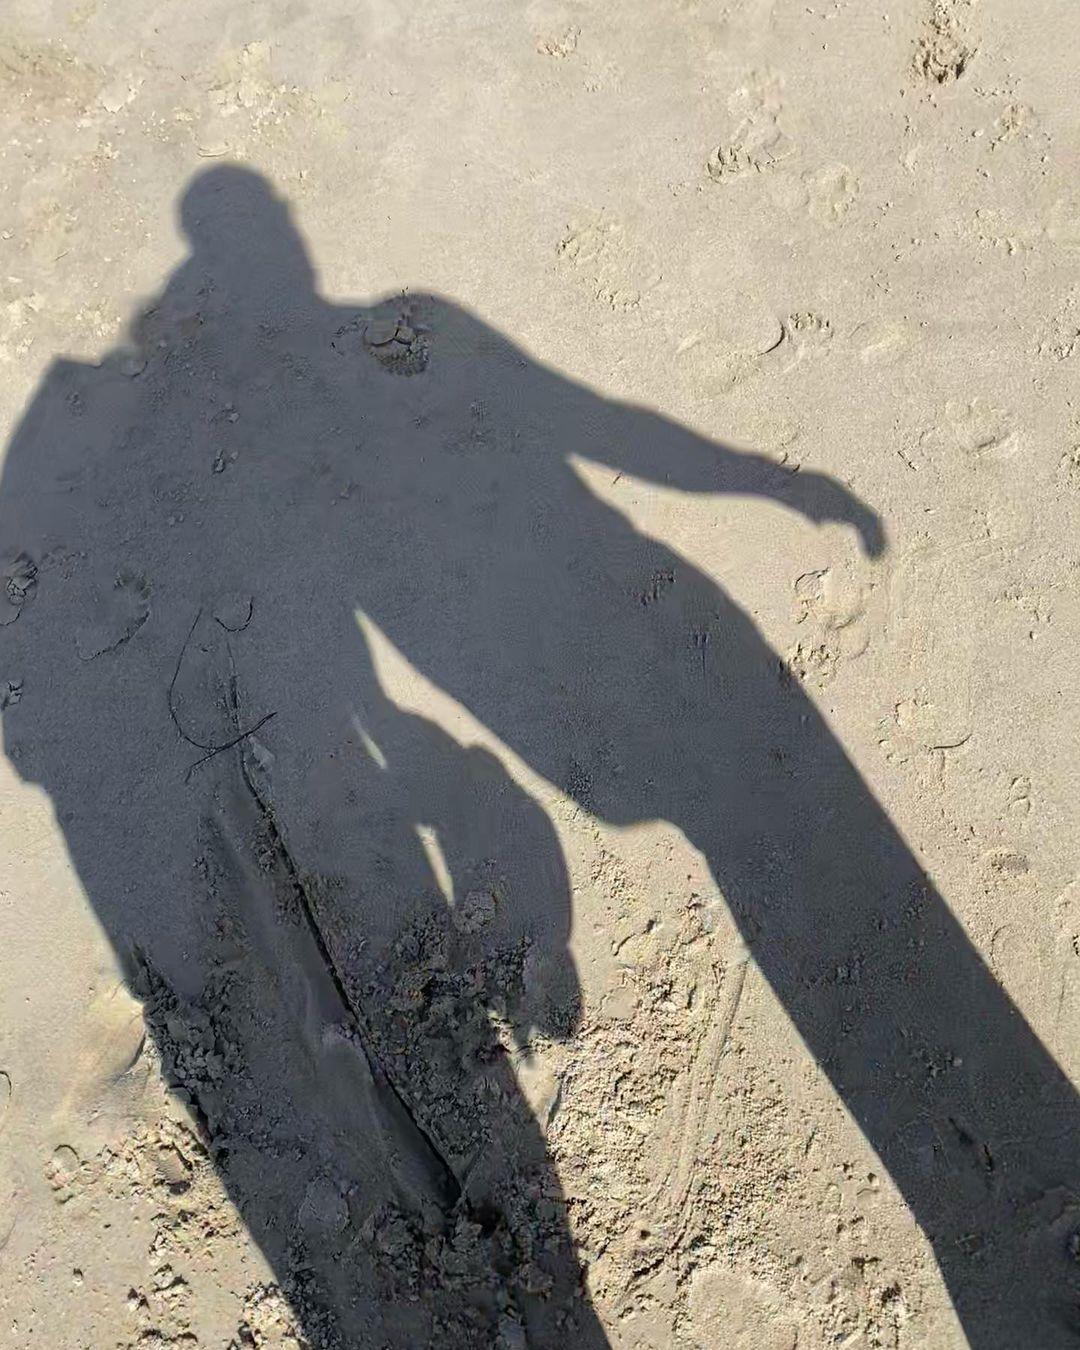 Just love: Хайди Клум и Том Каулитц на пляже в Калифорнии